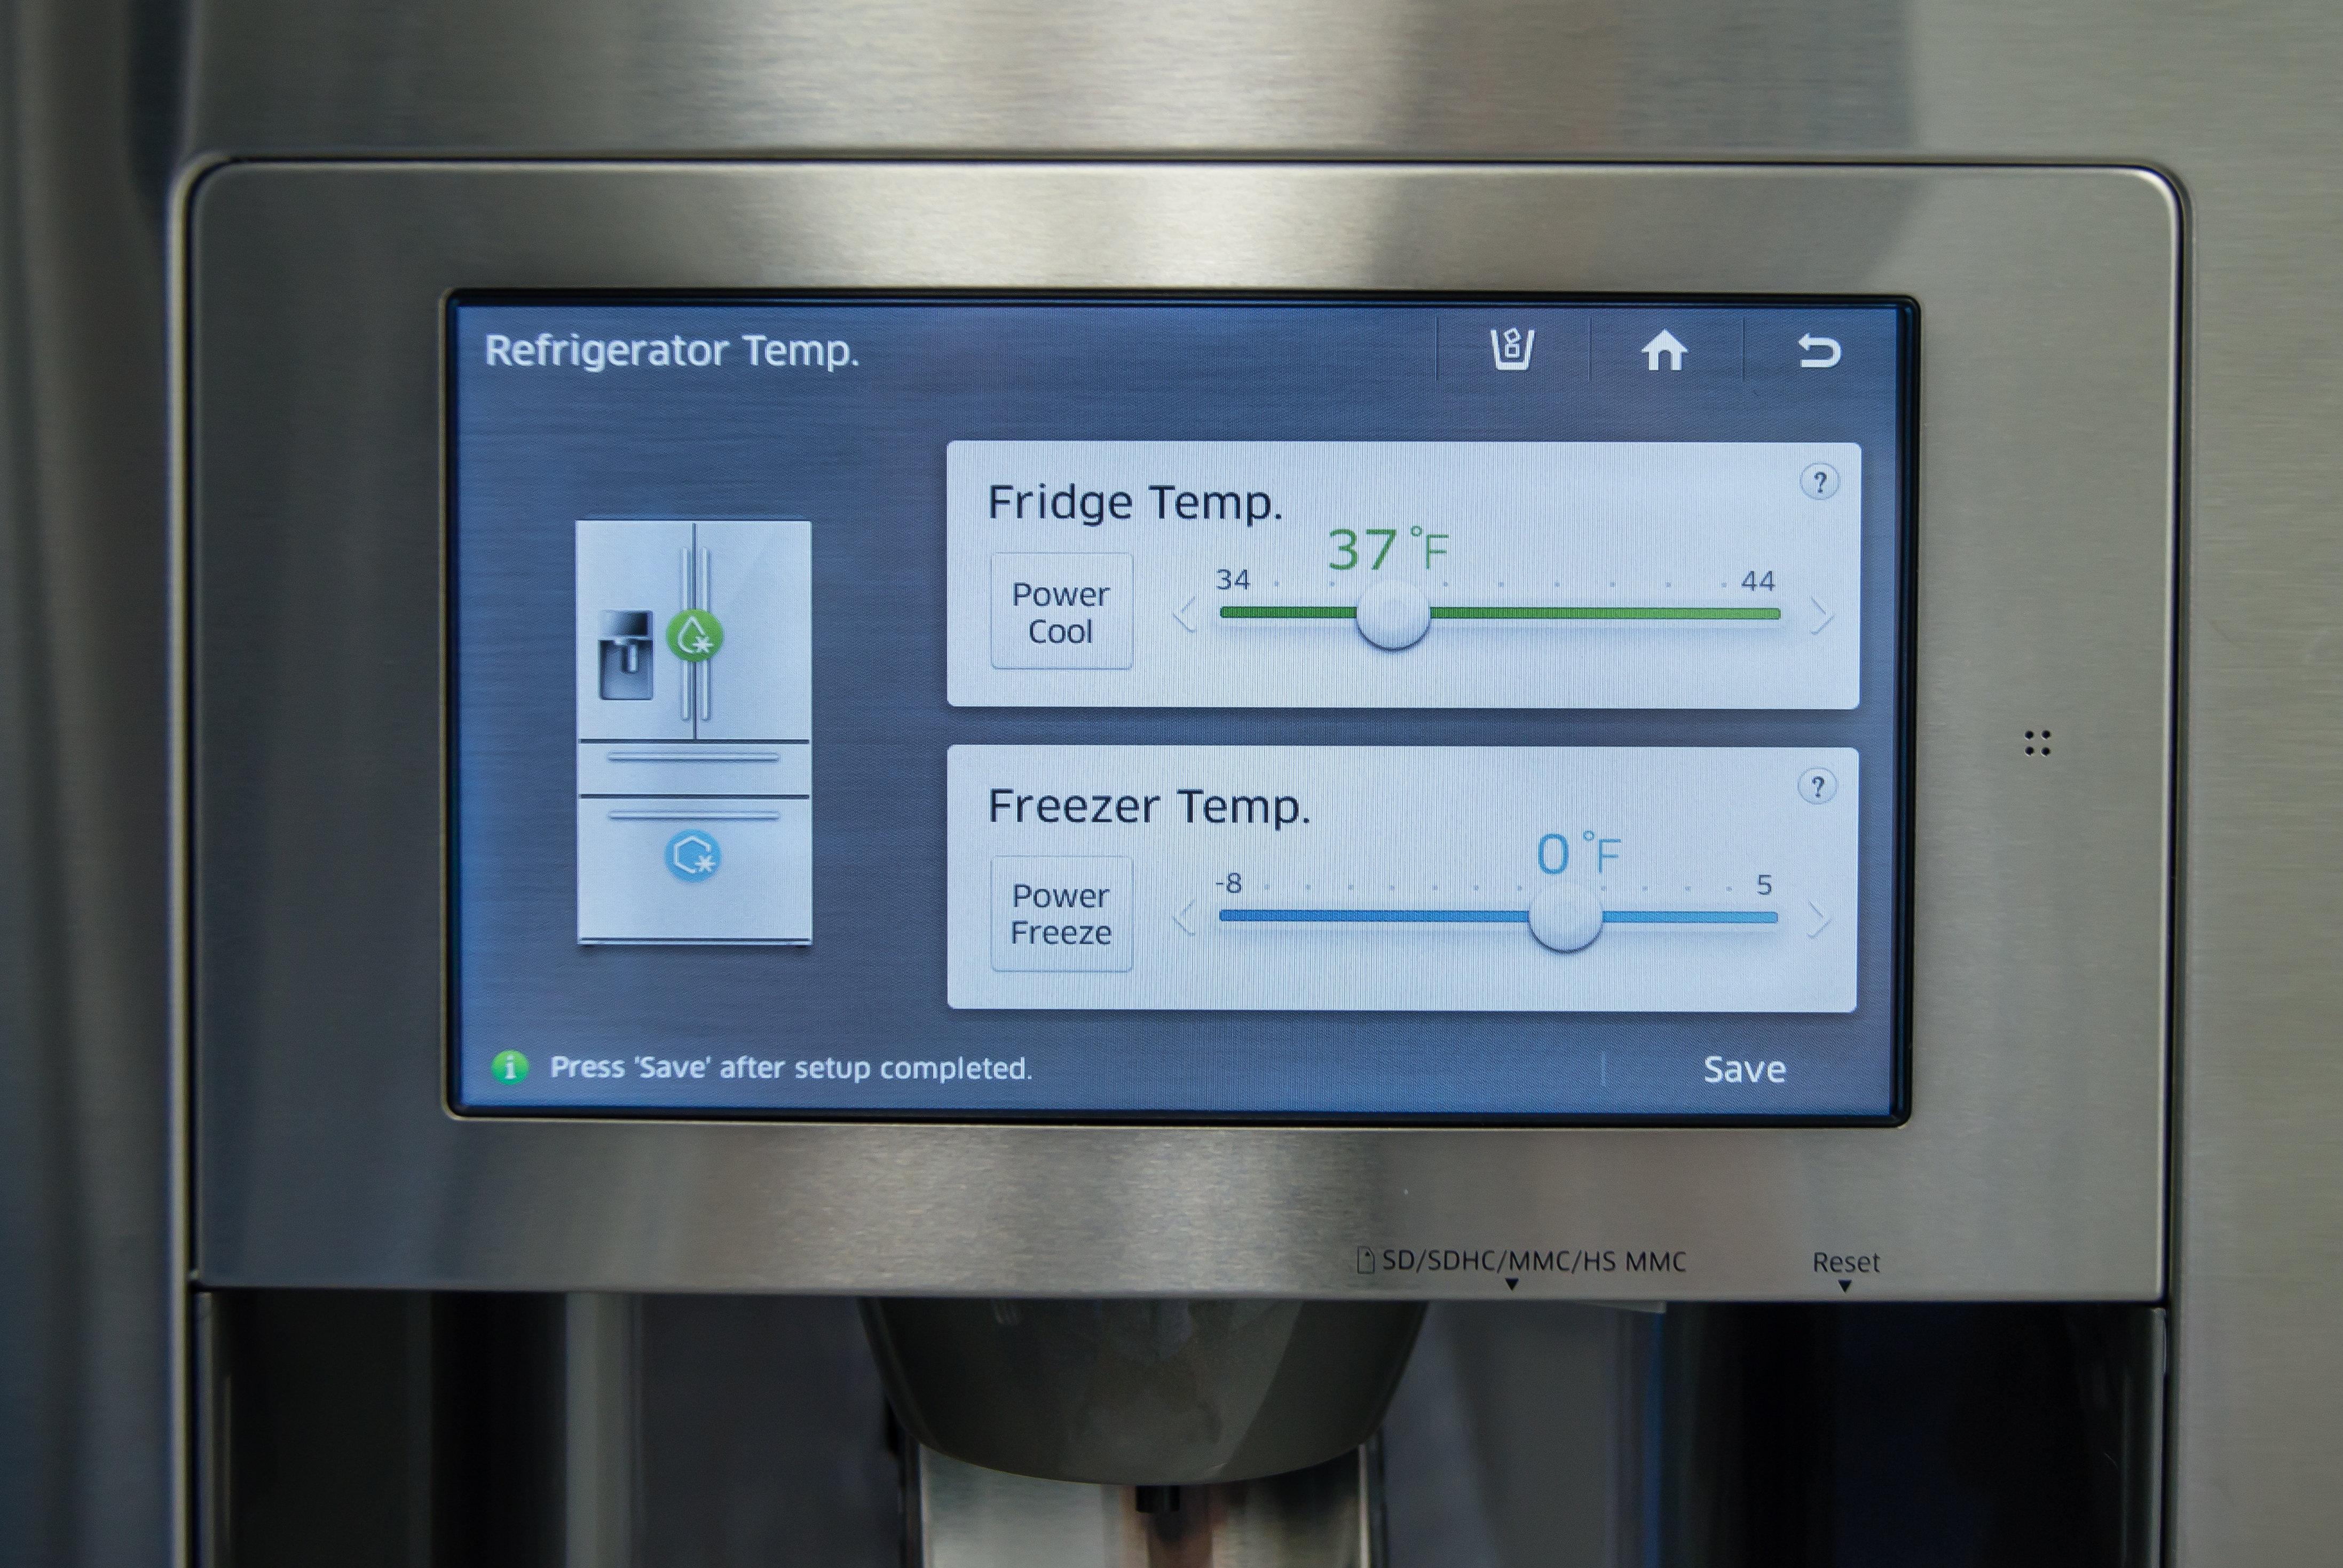 Temperature controls for the fridge and freezer